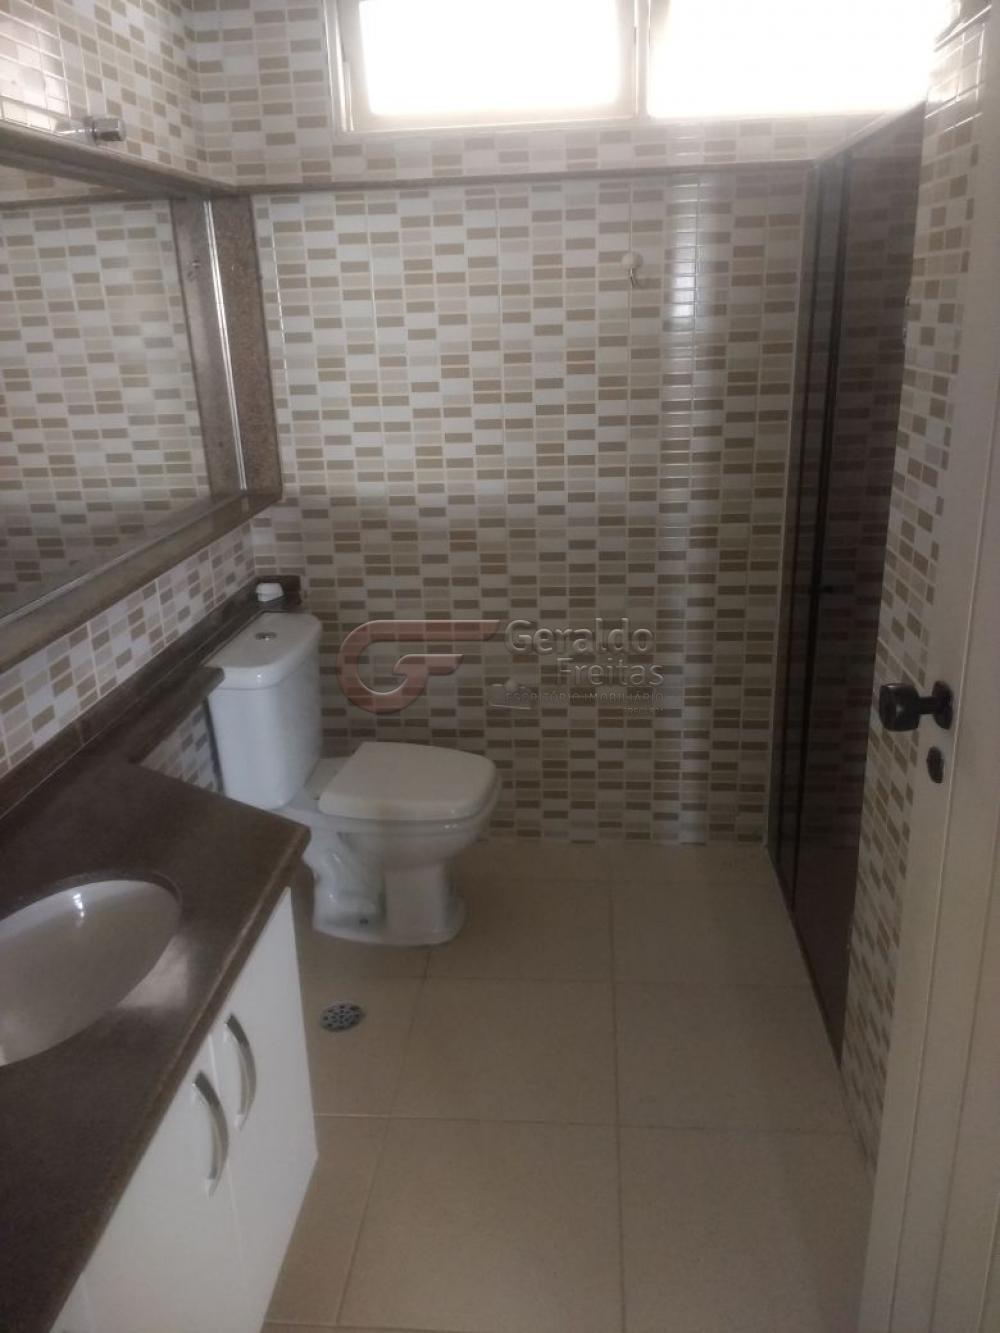 Comprar Casas / Condominio em Maceió apenas R$ 550.000,00 - Foto 3